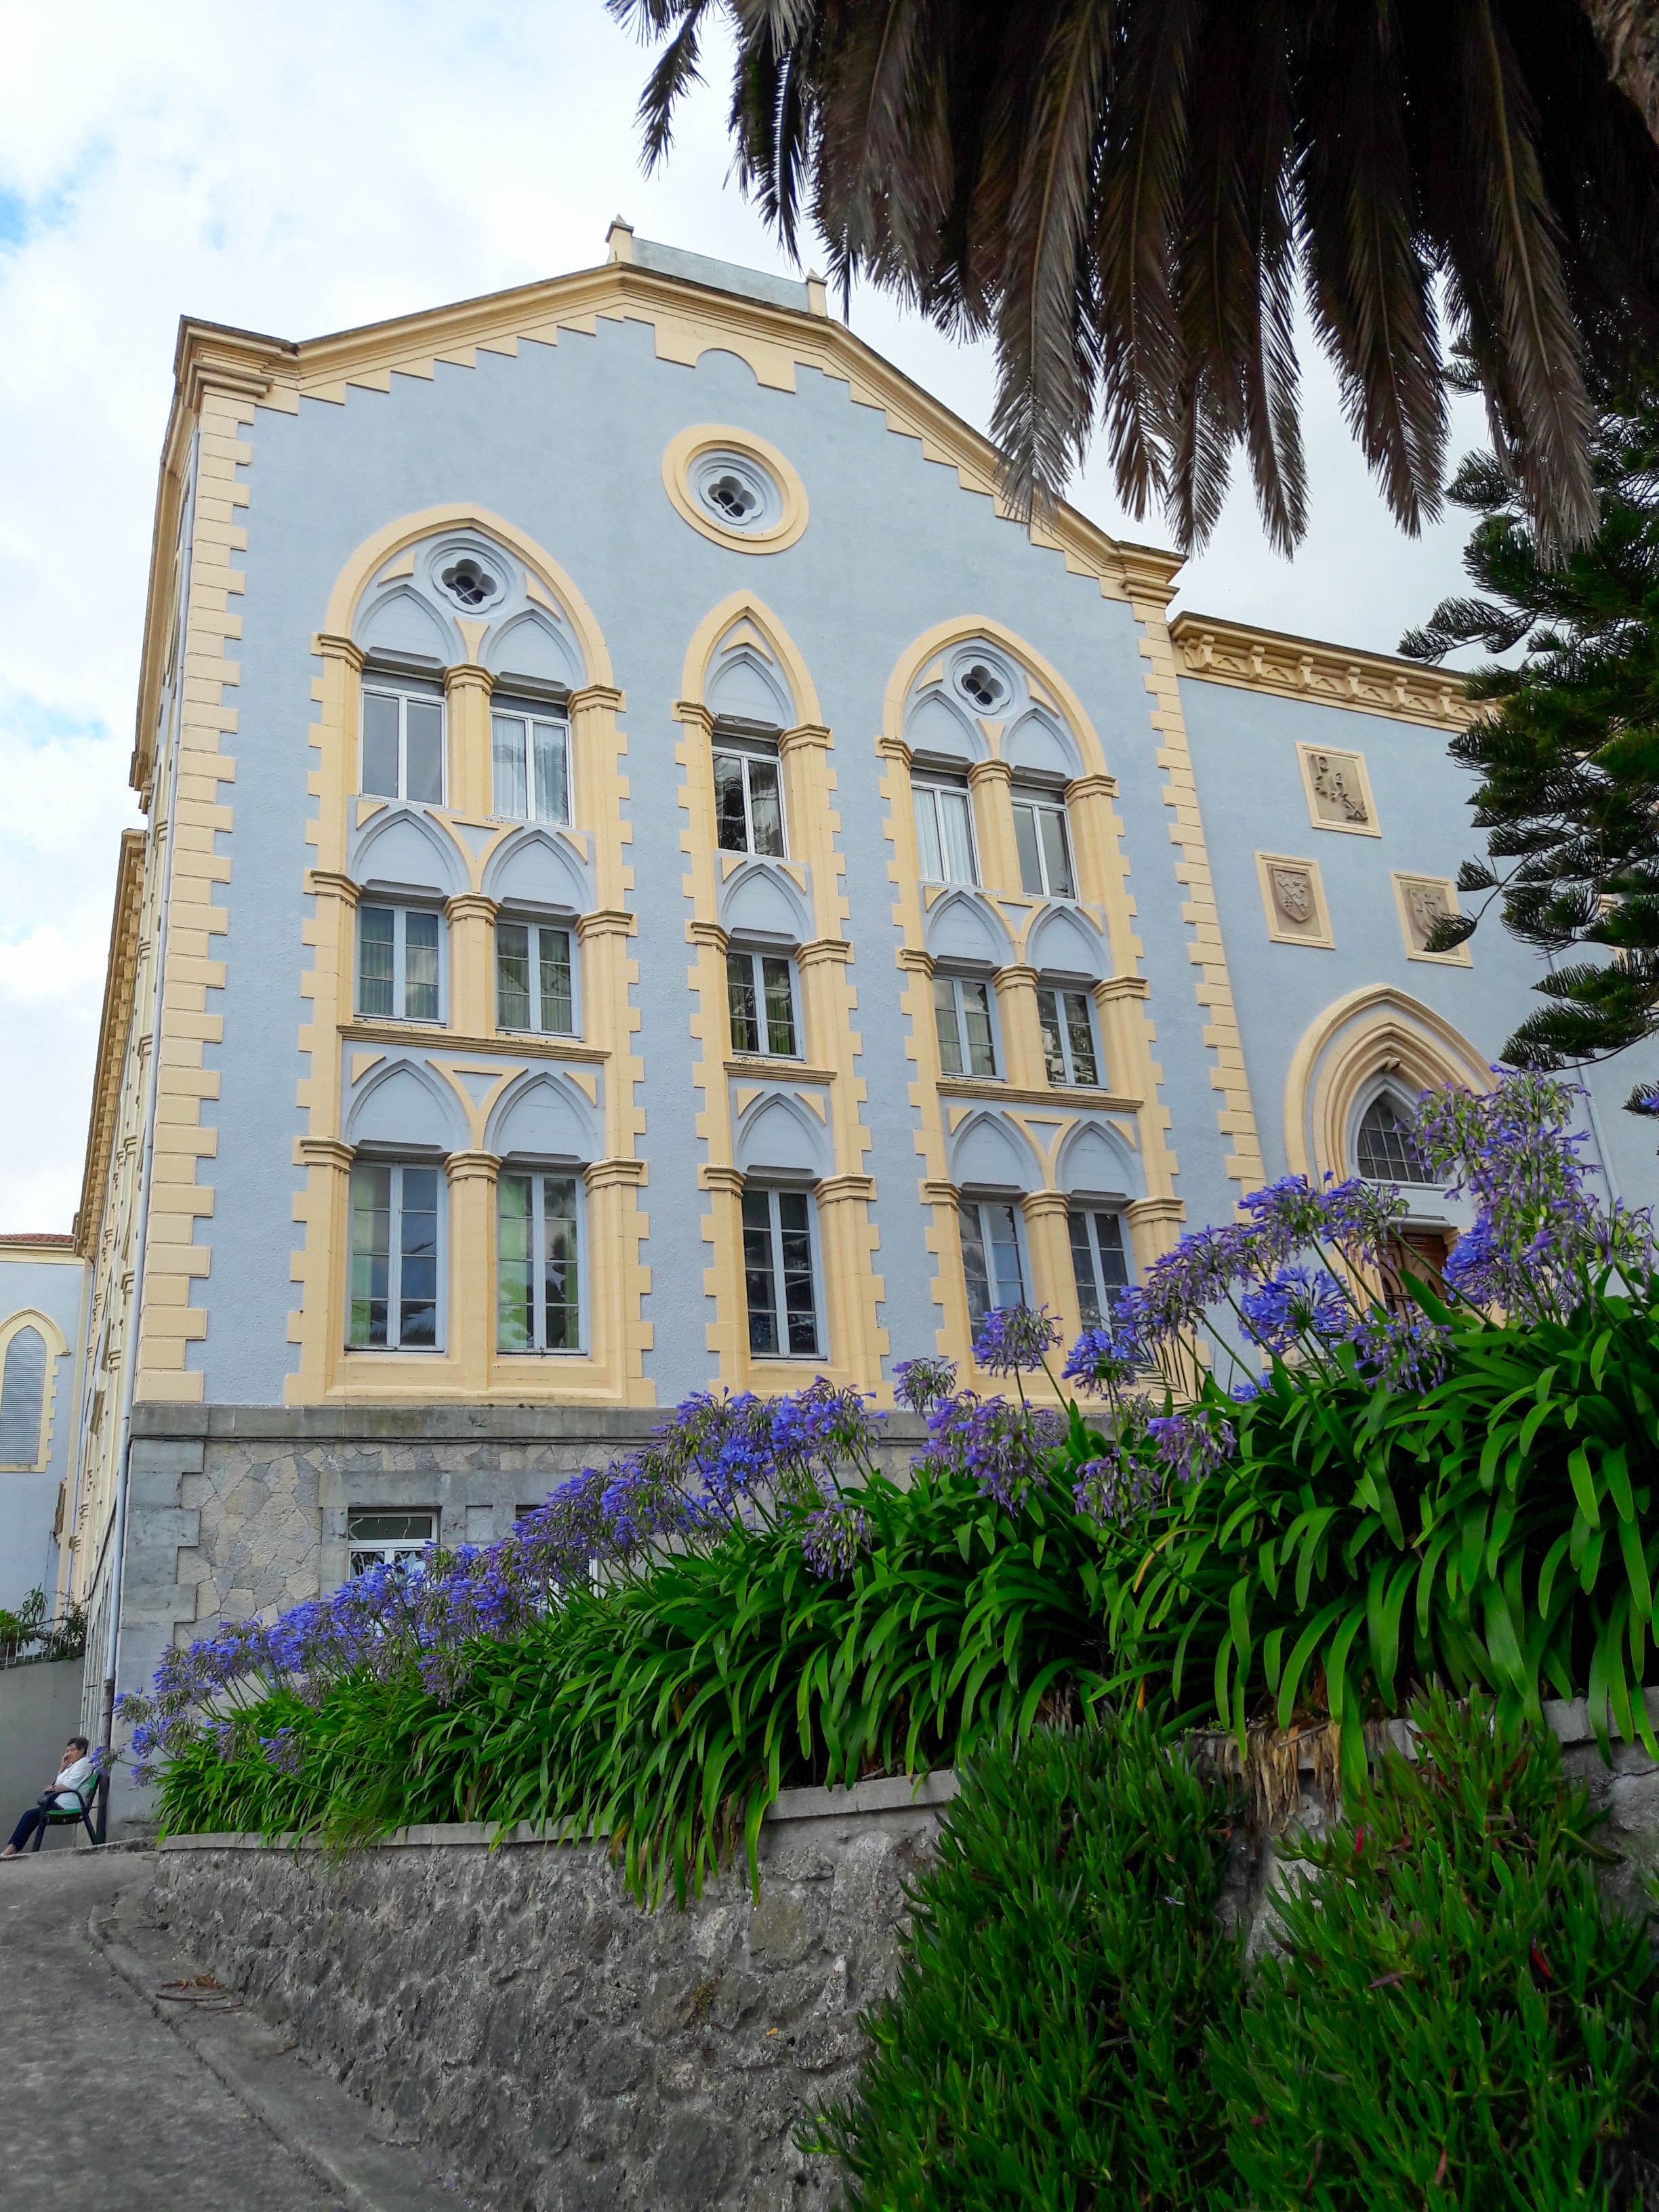 Cictercian abbey of Viaceli, Cóbreces